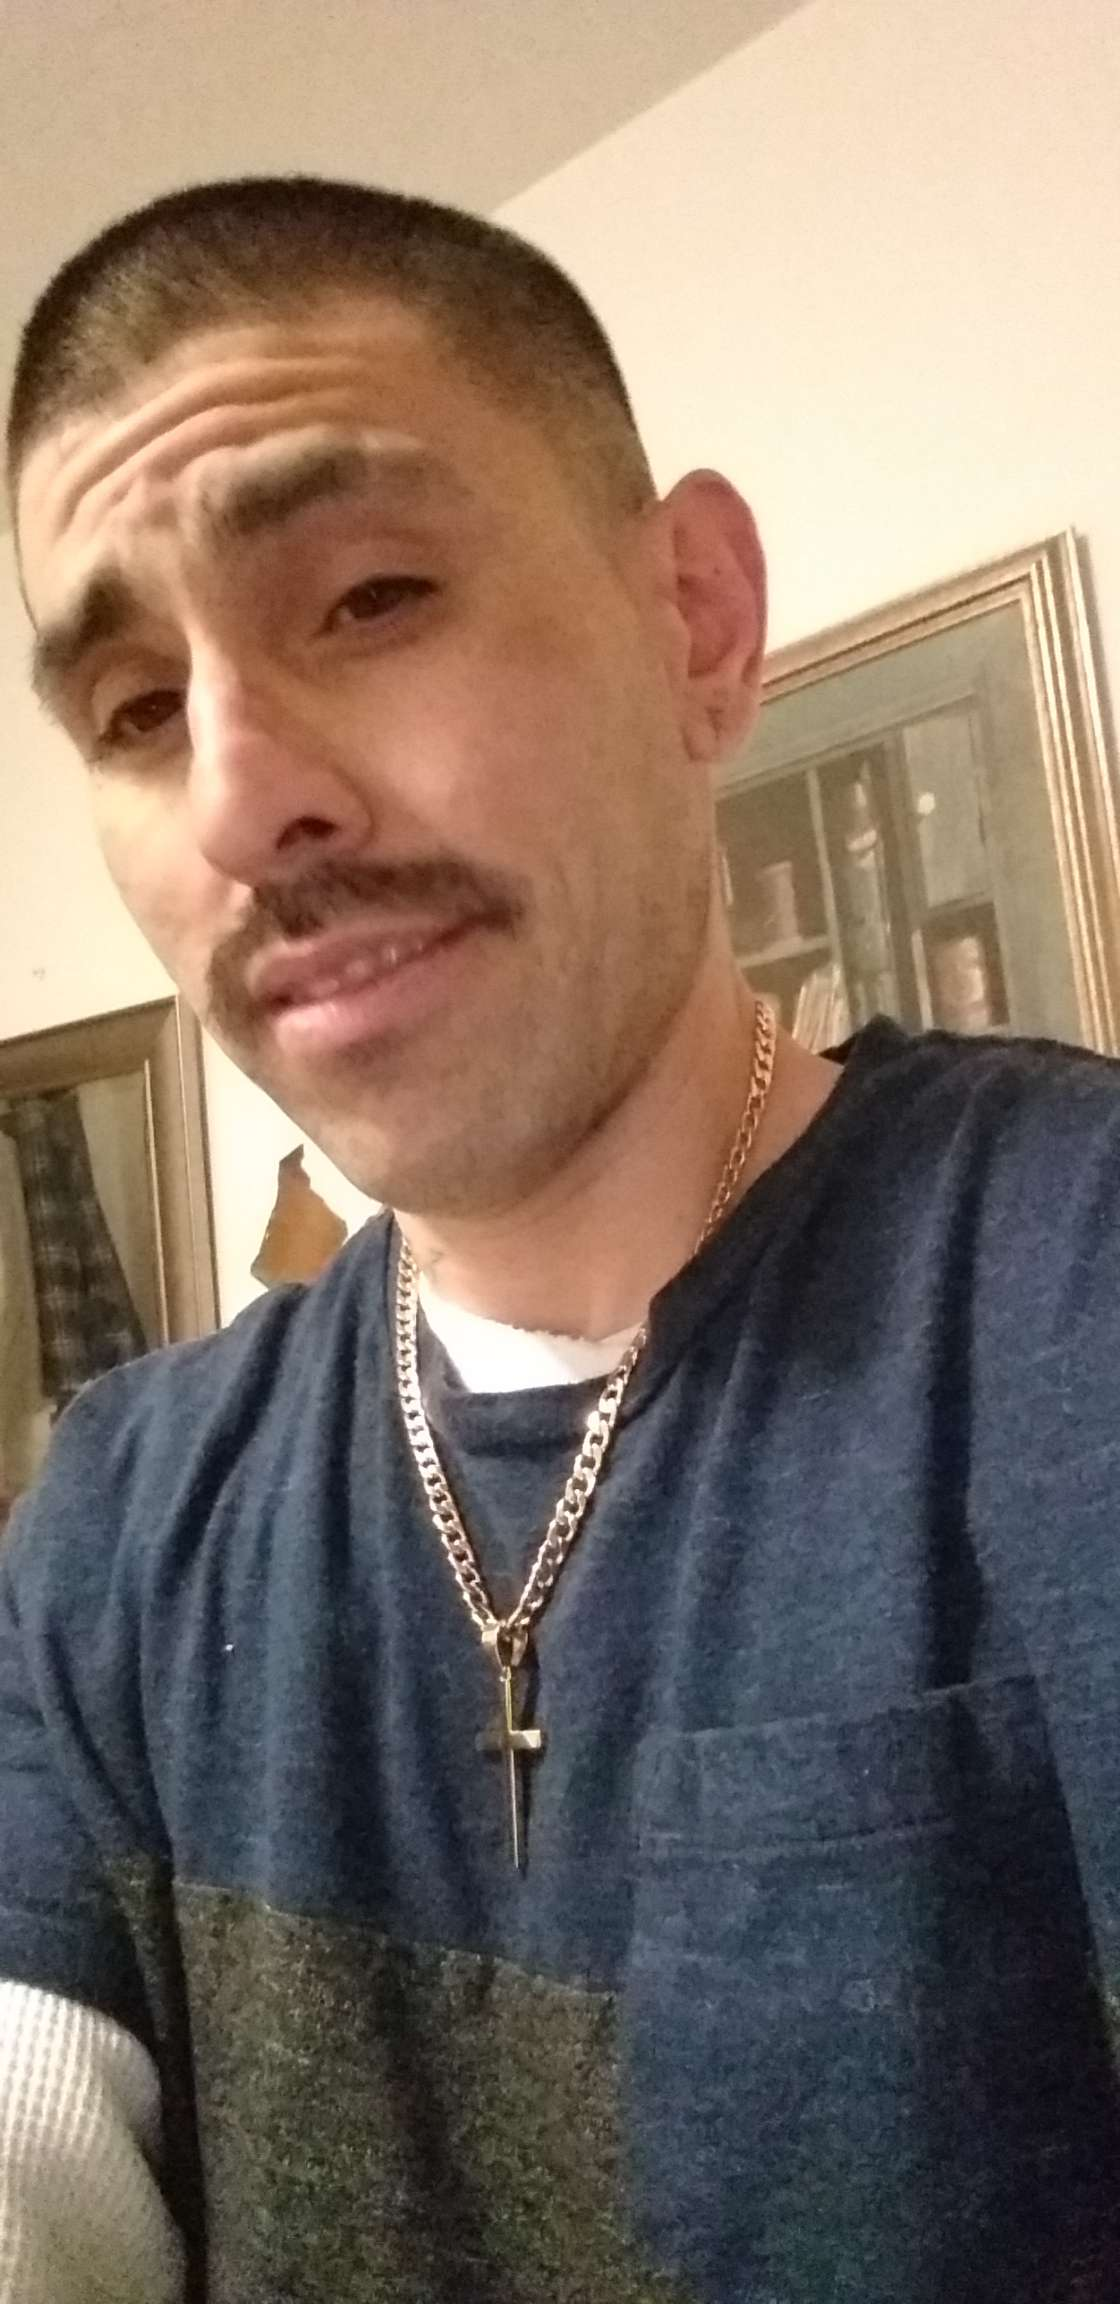 Jose Ortiz's profile image